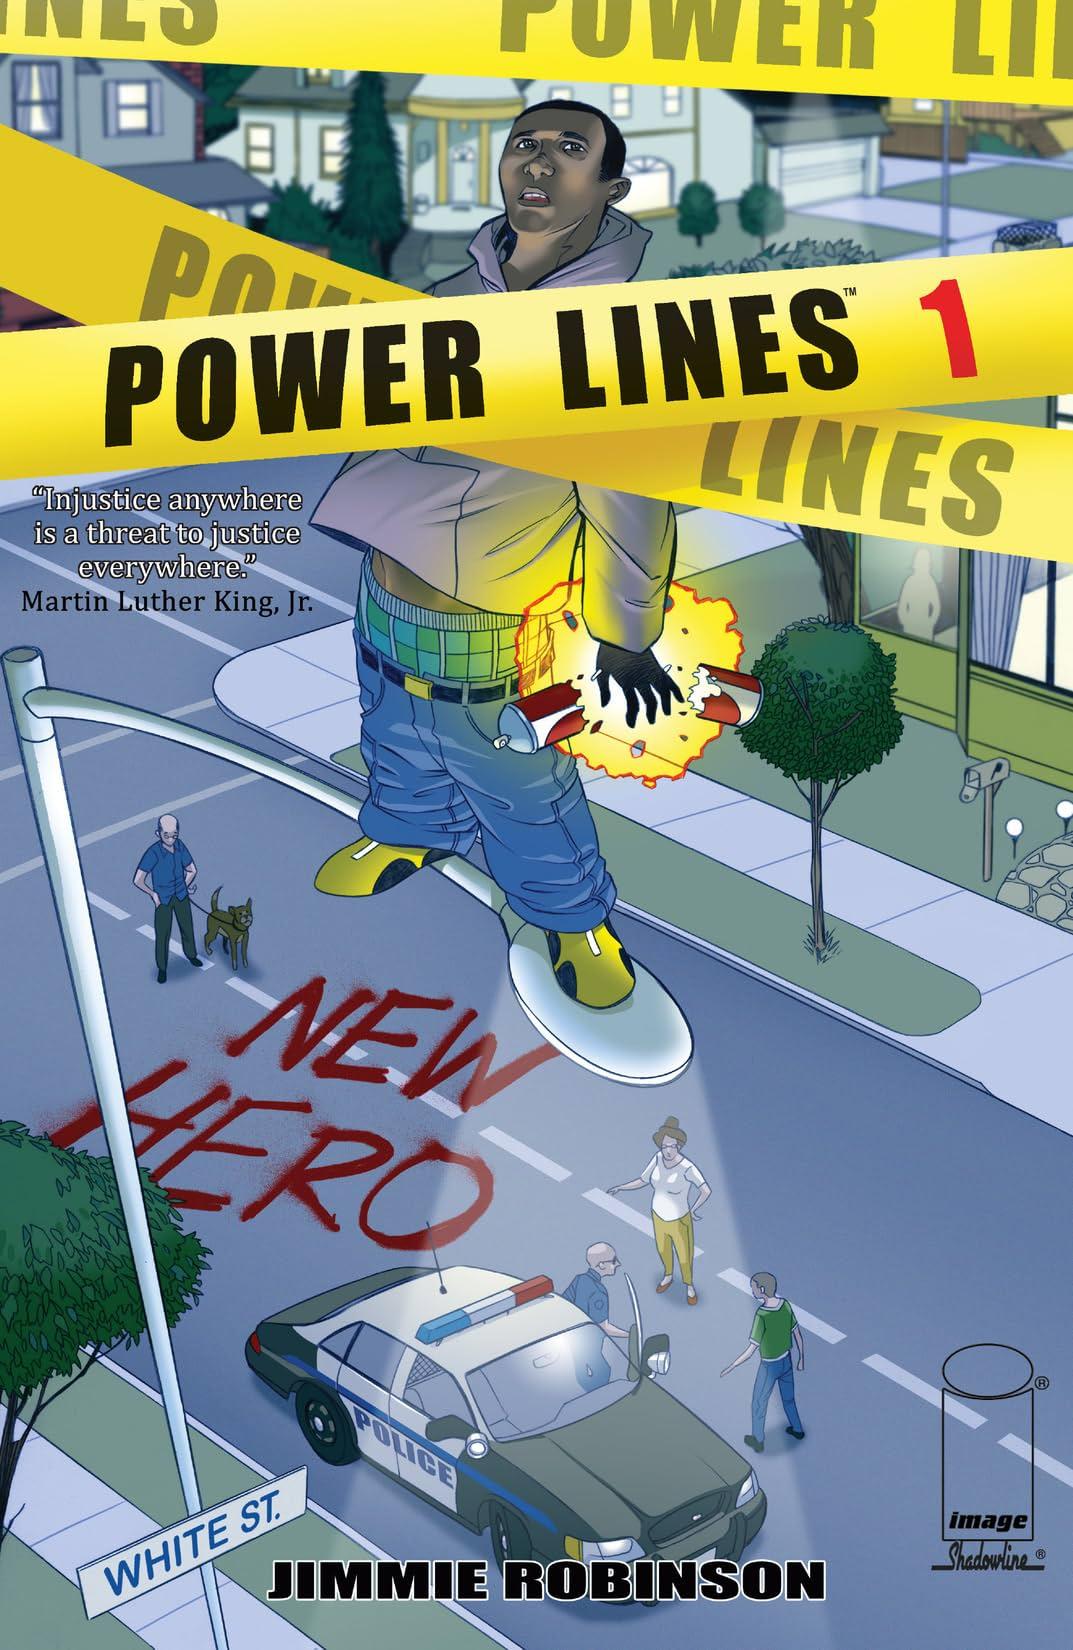 Power Lines #1